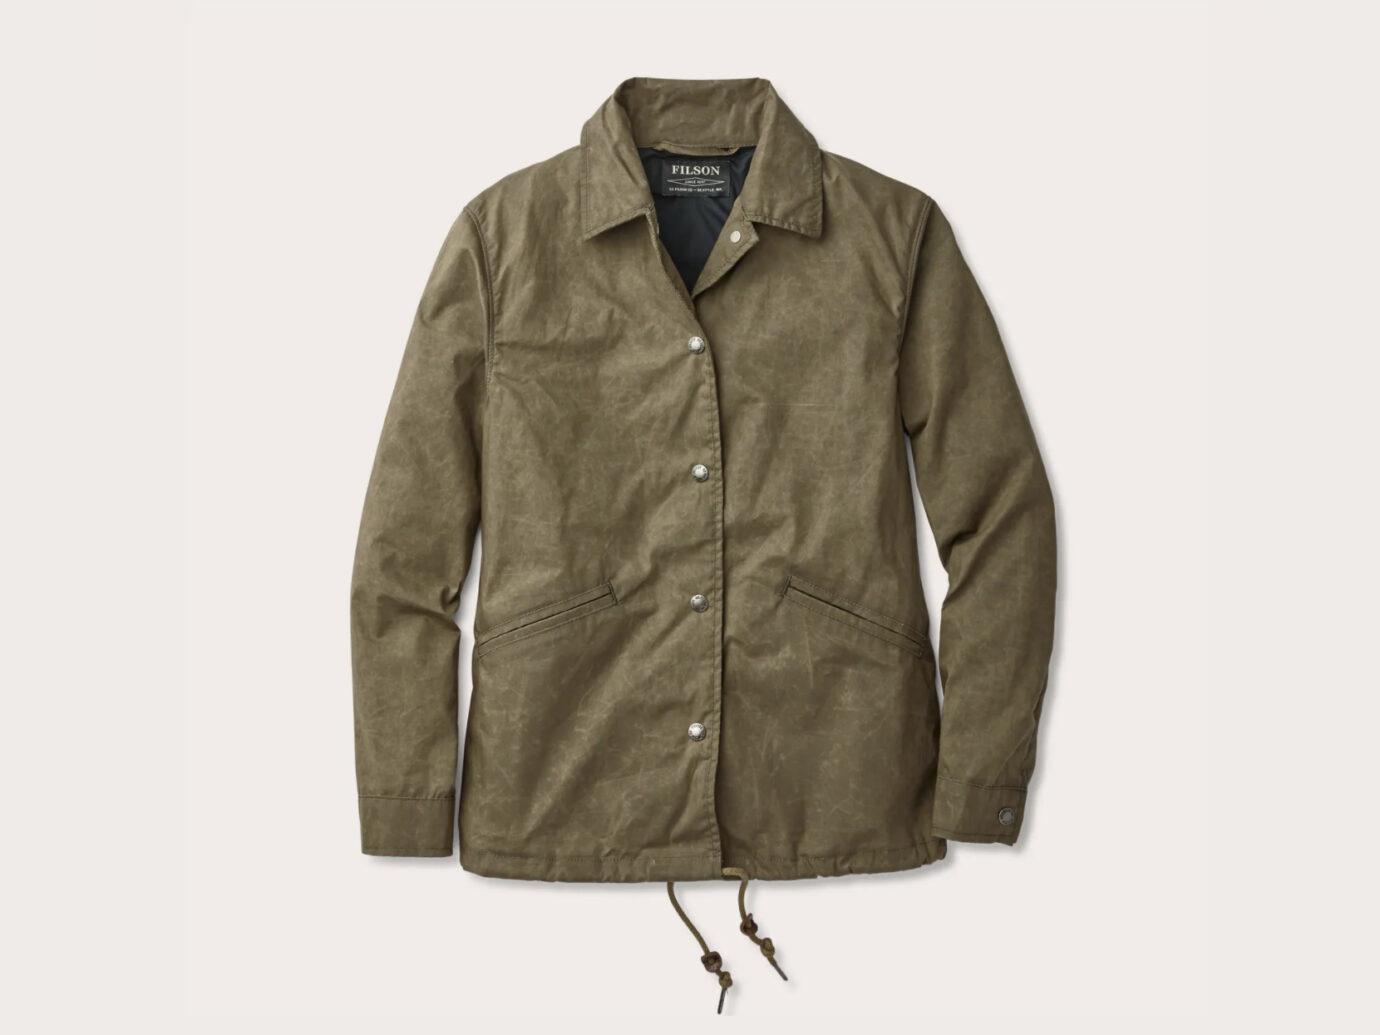 Filson Bushwax Supply Jacket